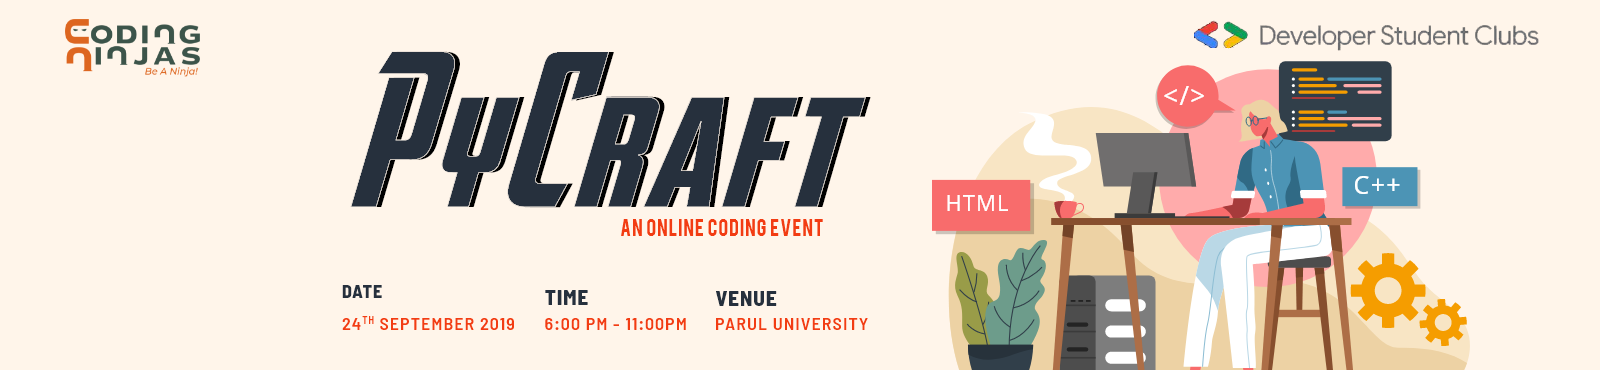 PyCraft - An Online Coding Event